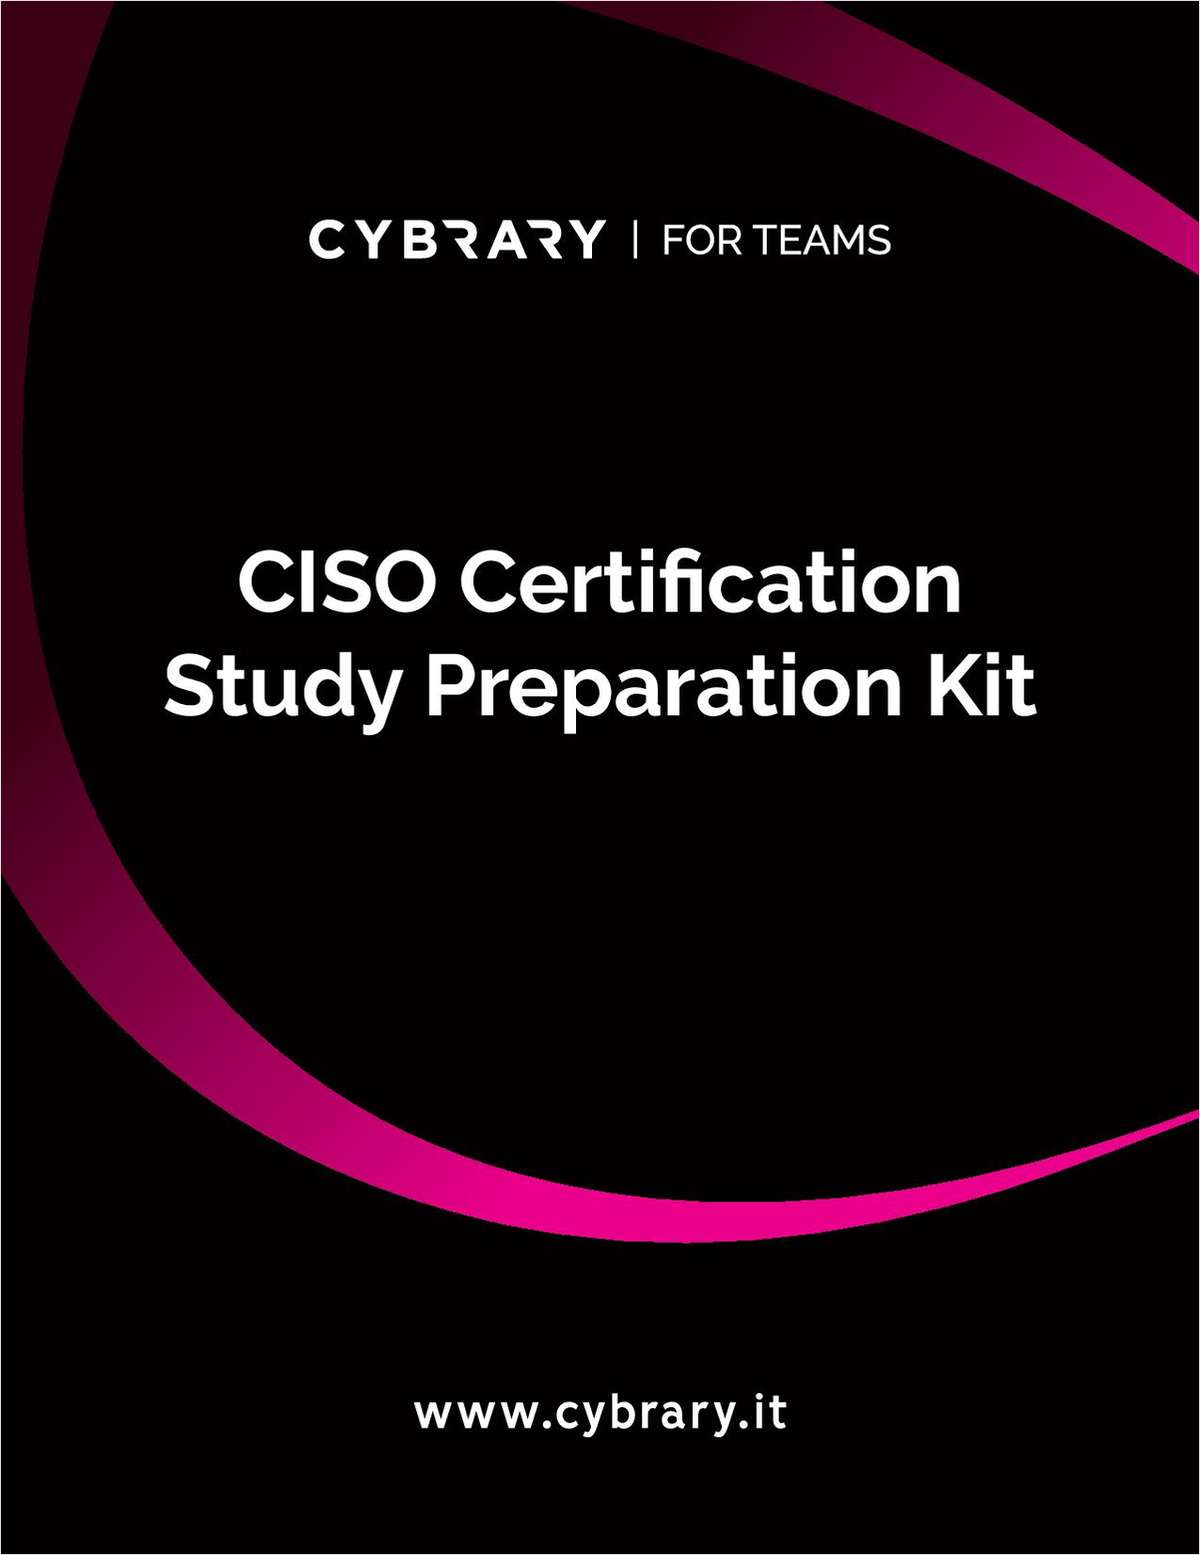 CISO Certification Study Preparation Kit